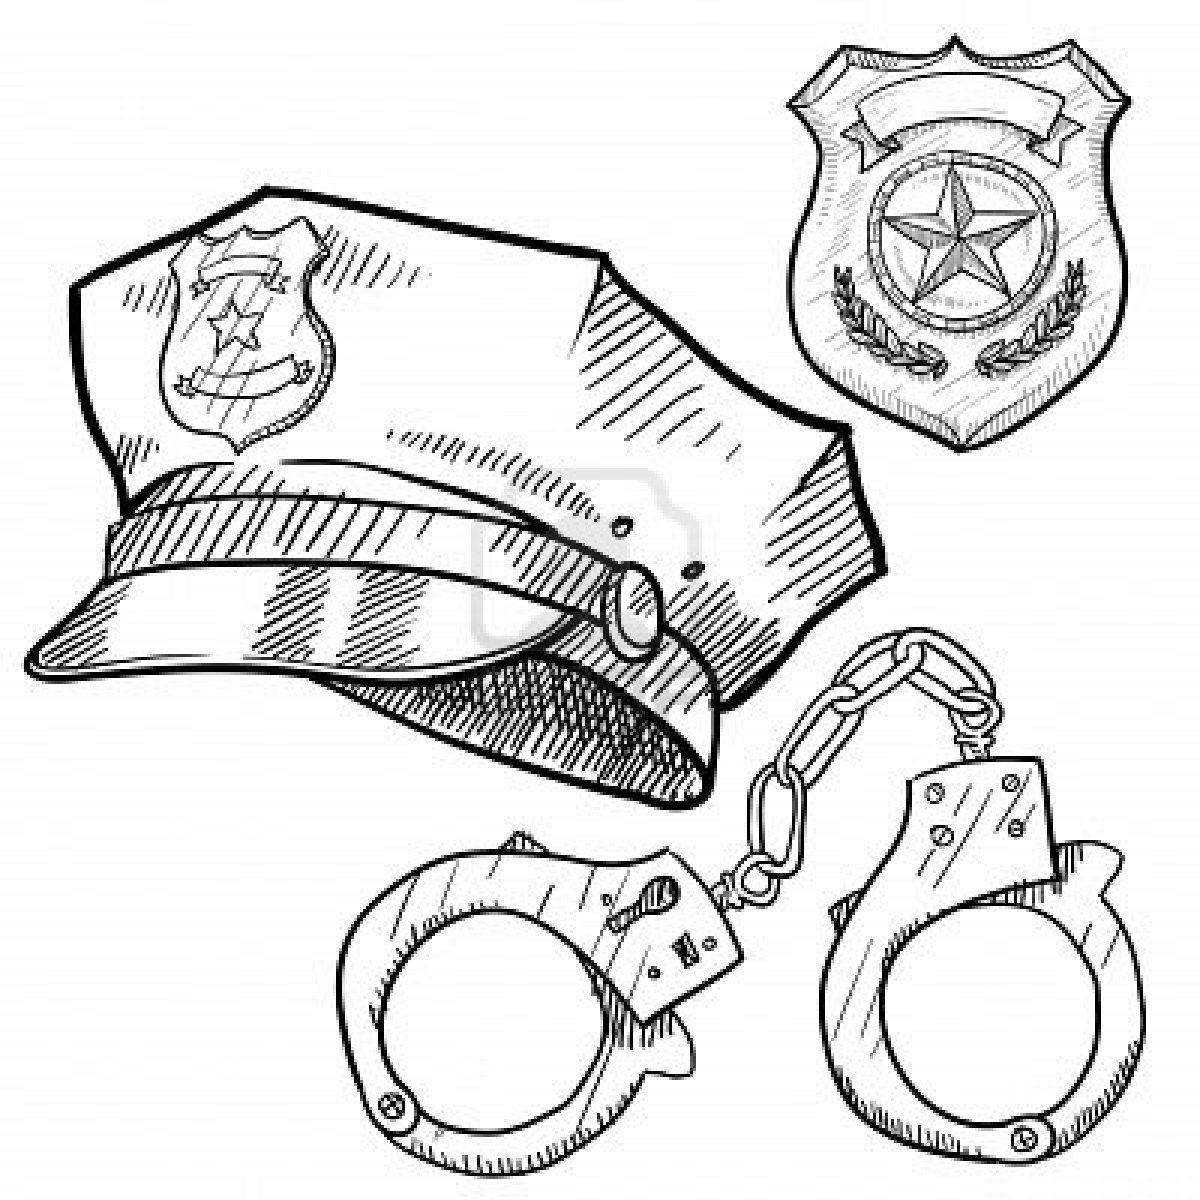 Pin de D. Inman en Corrections | Pinterest